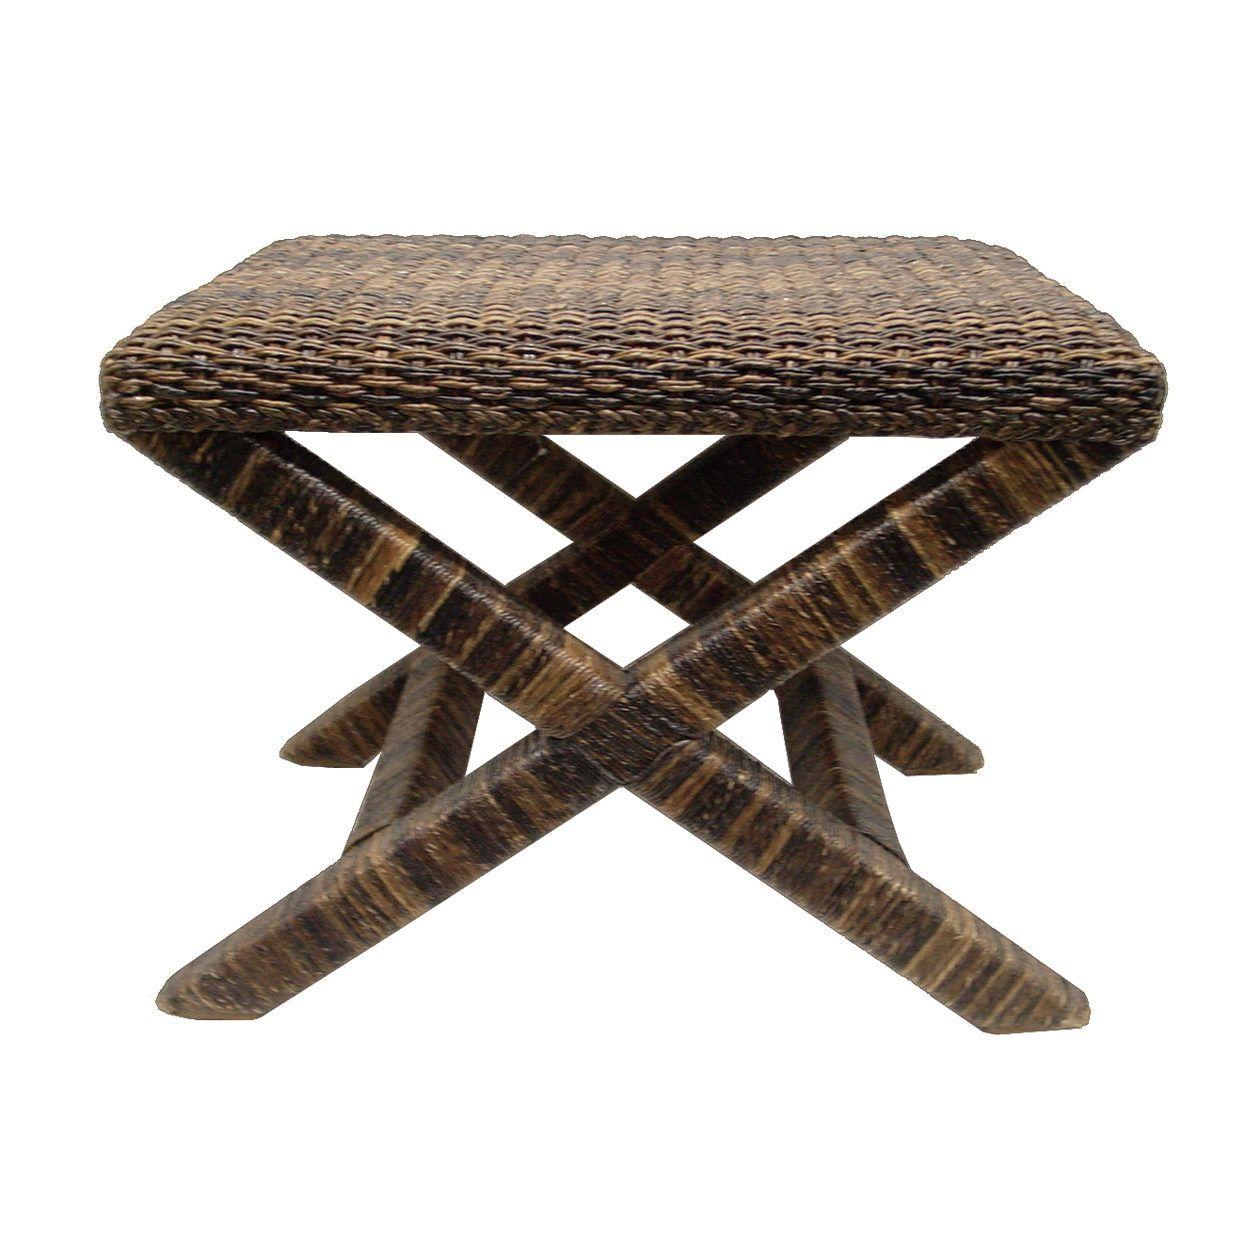 Lecek products f serengeticrossstool